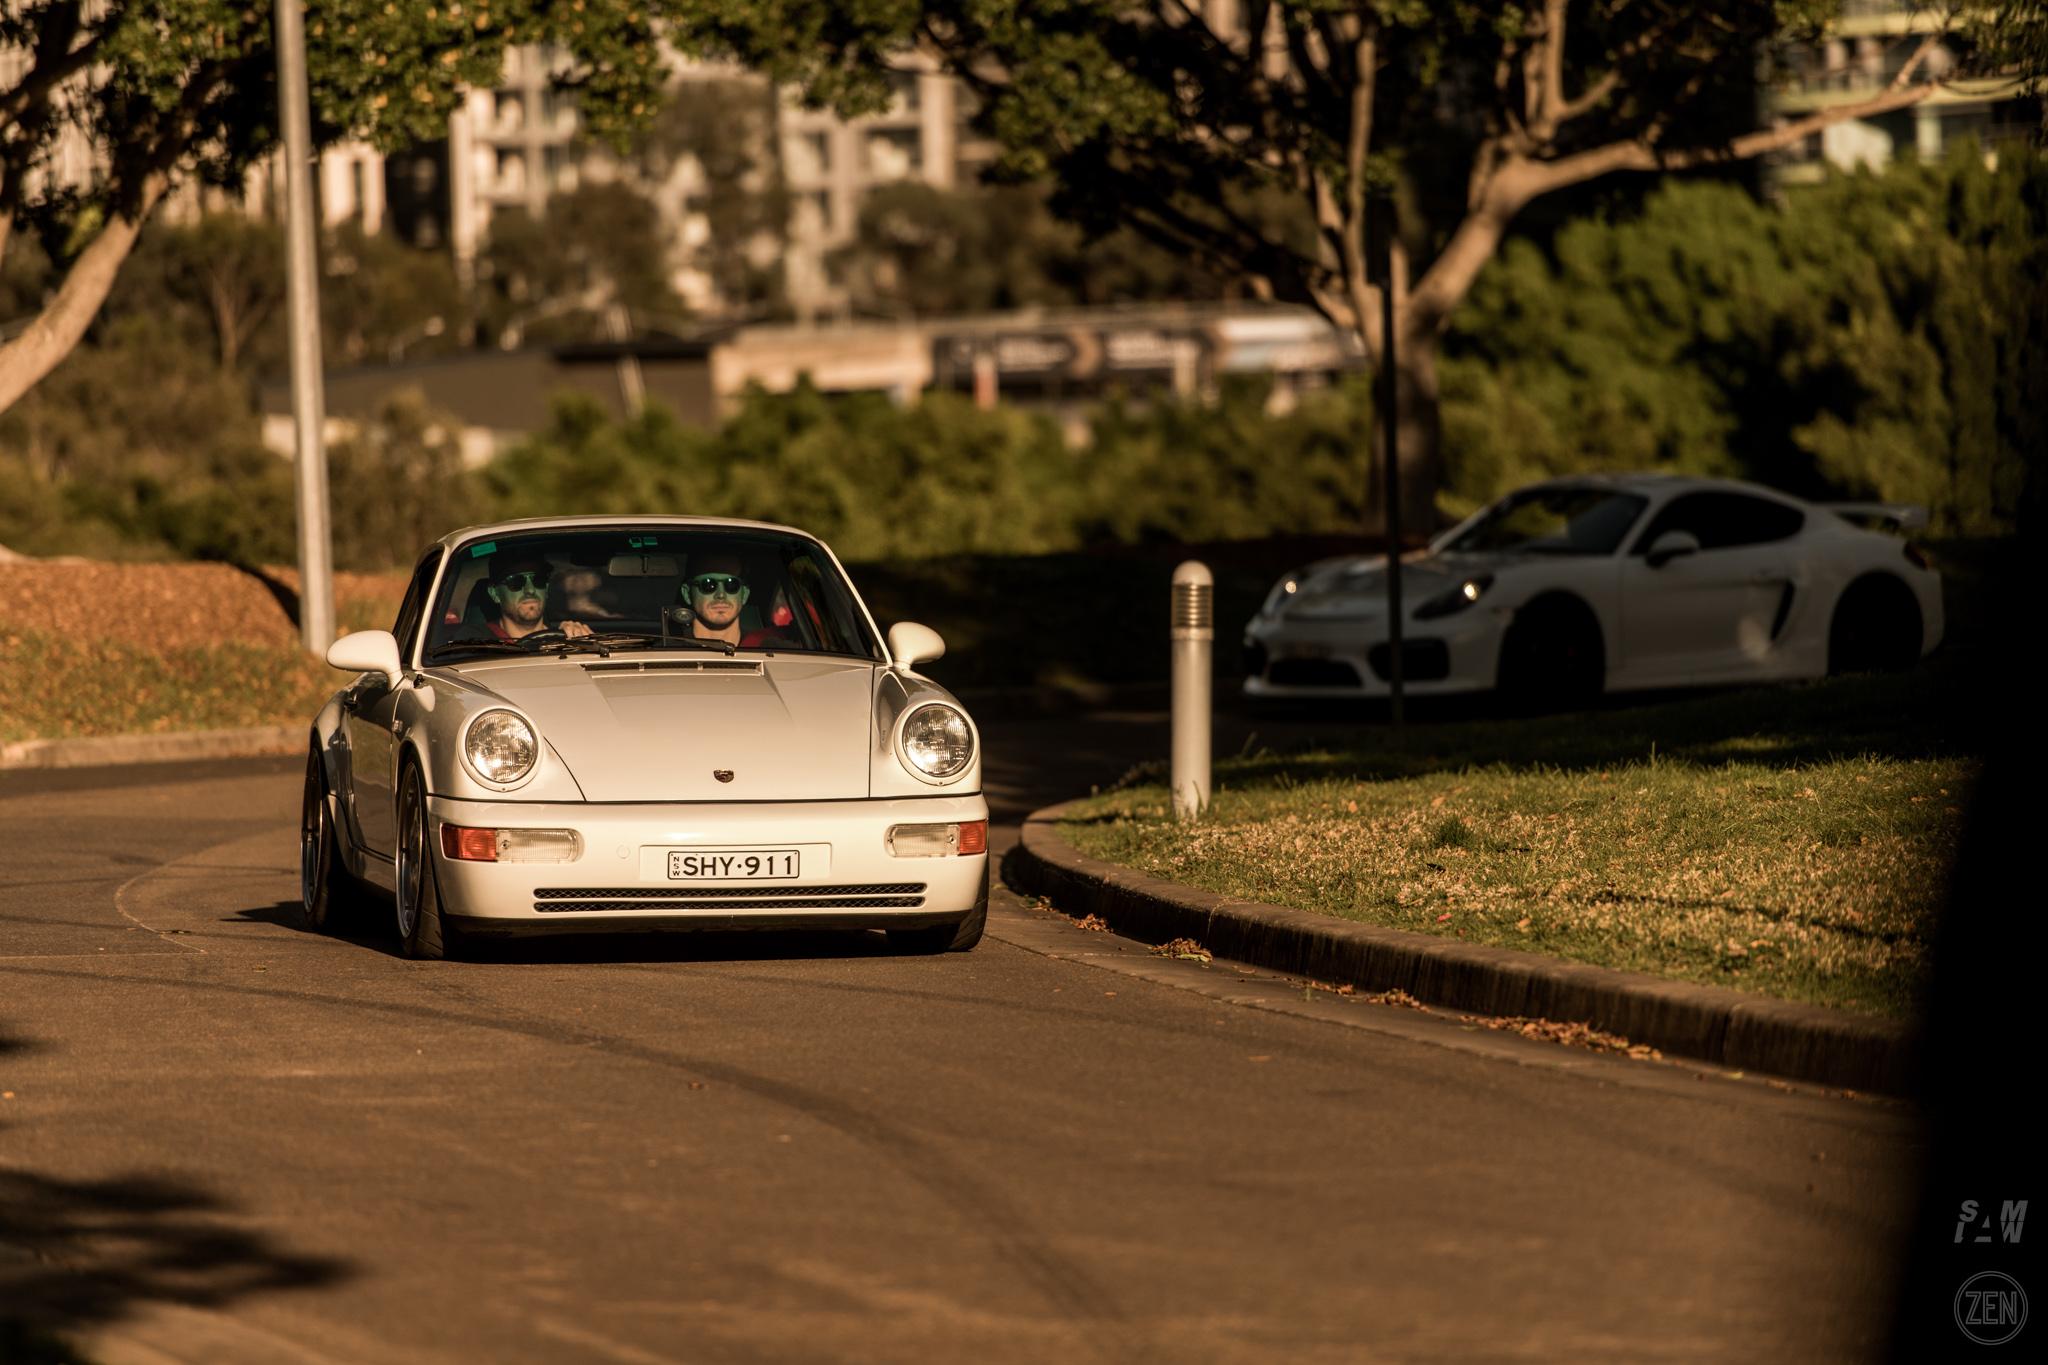 2019-10-27 - Autohaus Porsches & Coffee 078